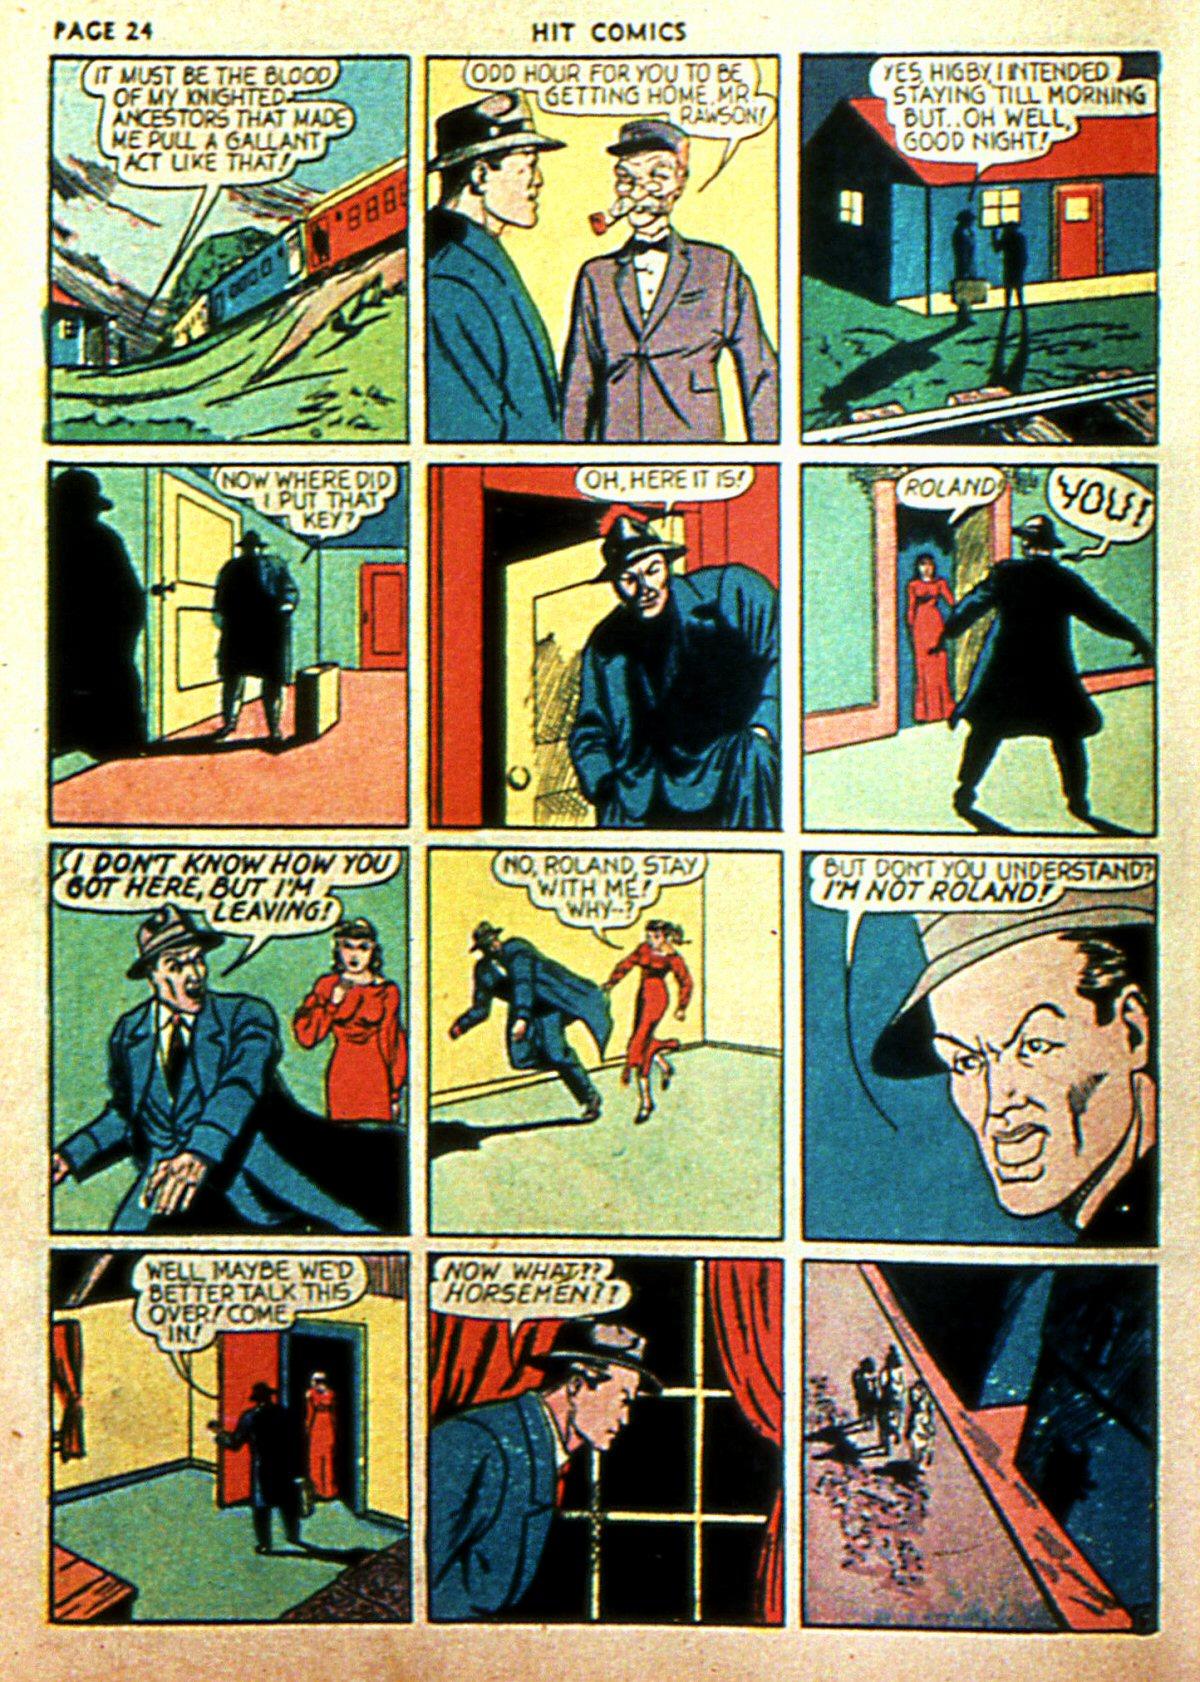 Read online Hit Comics comic -  Issue #2 - 26